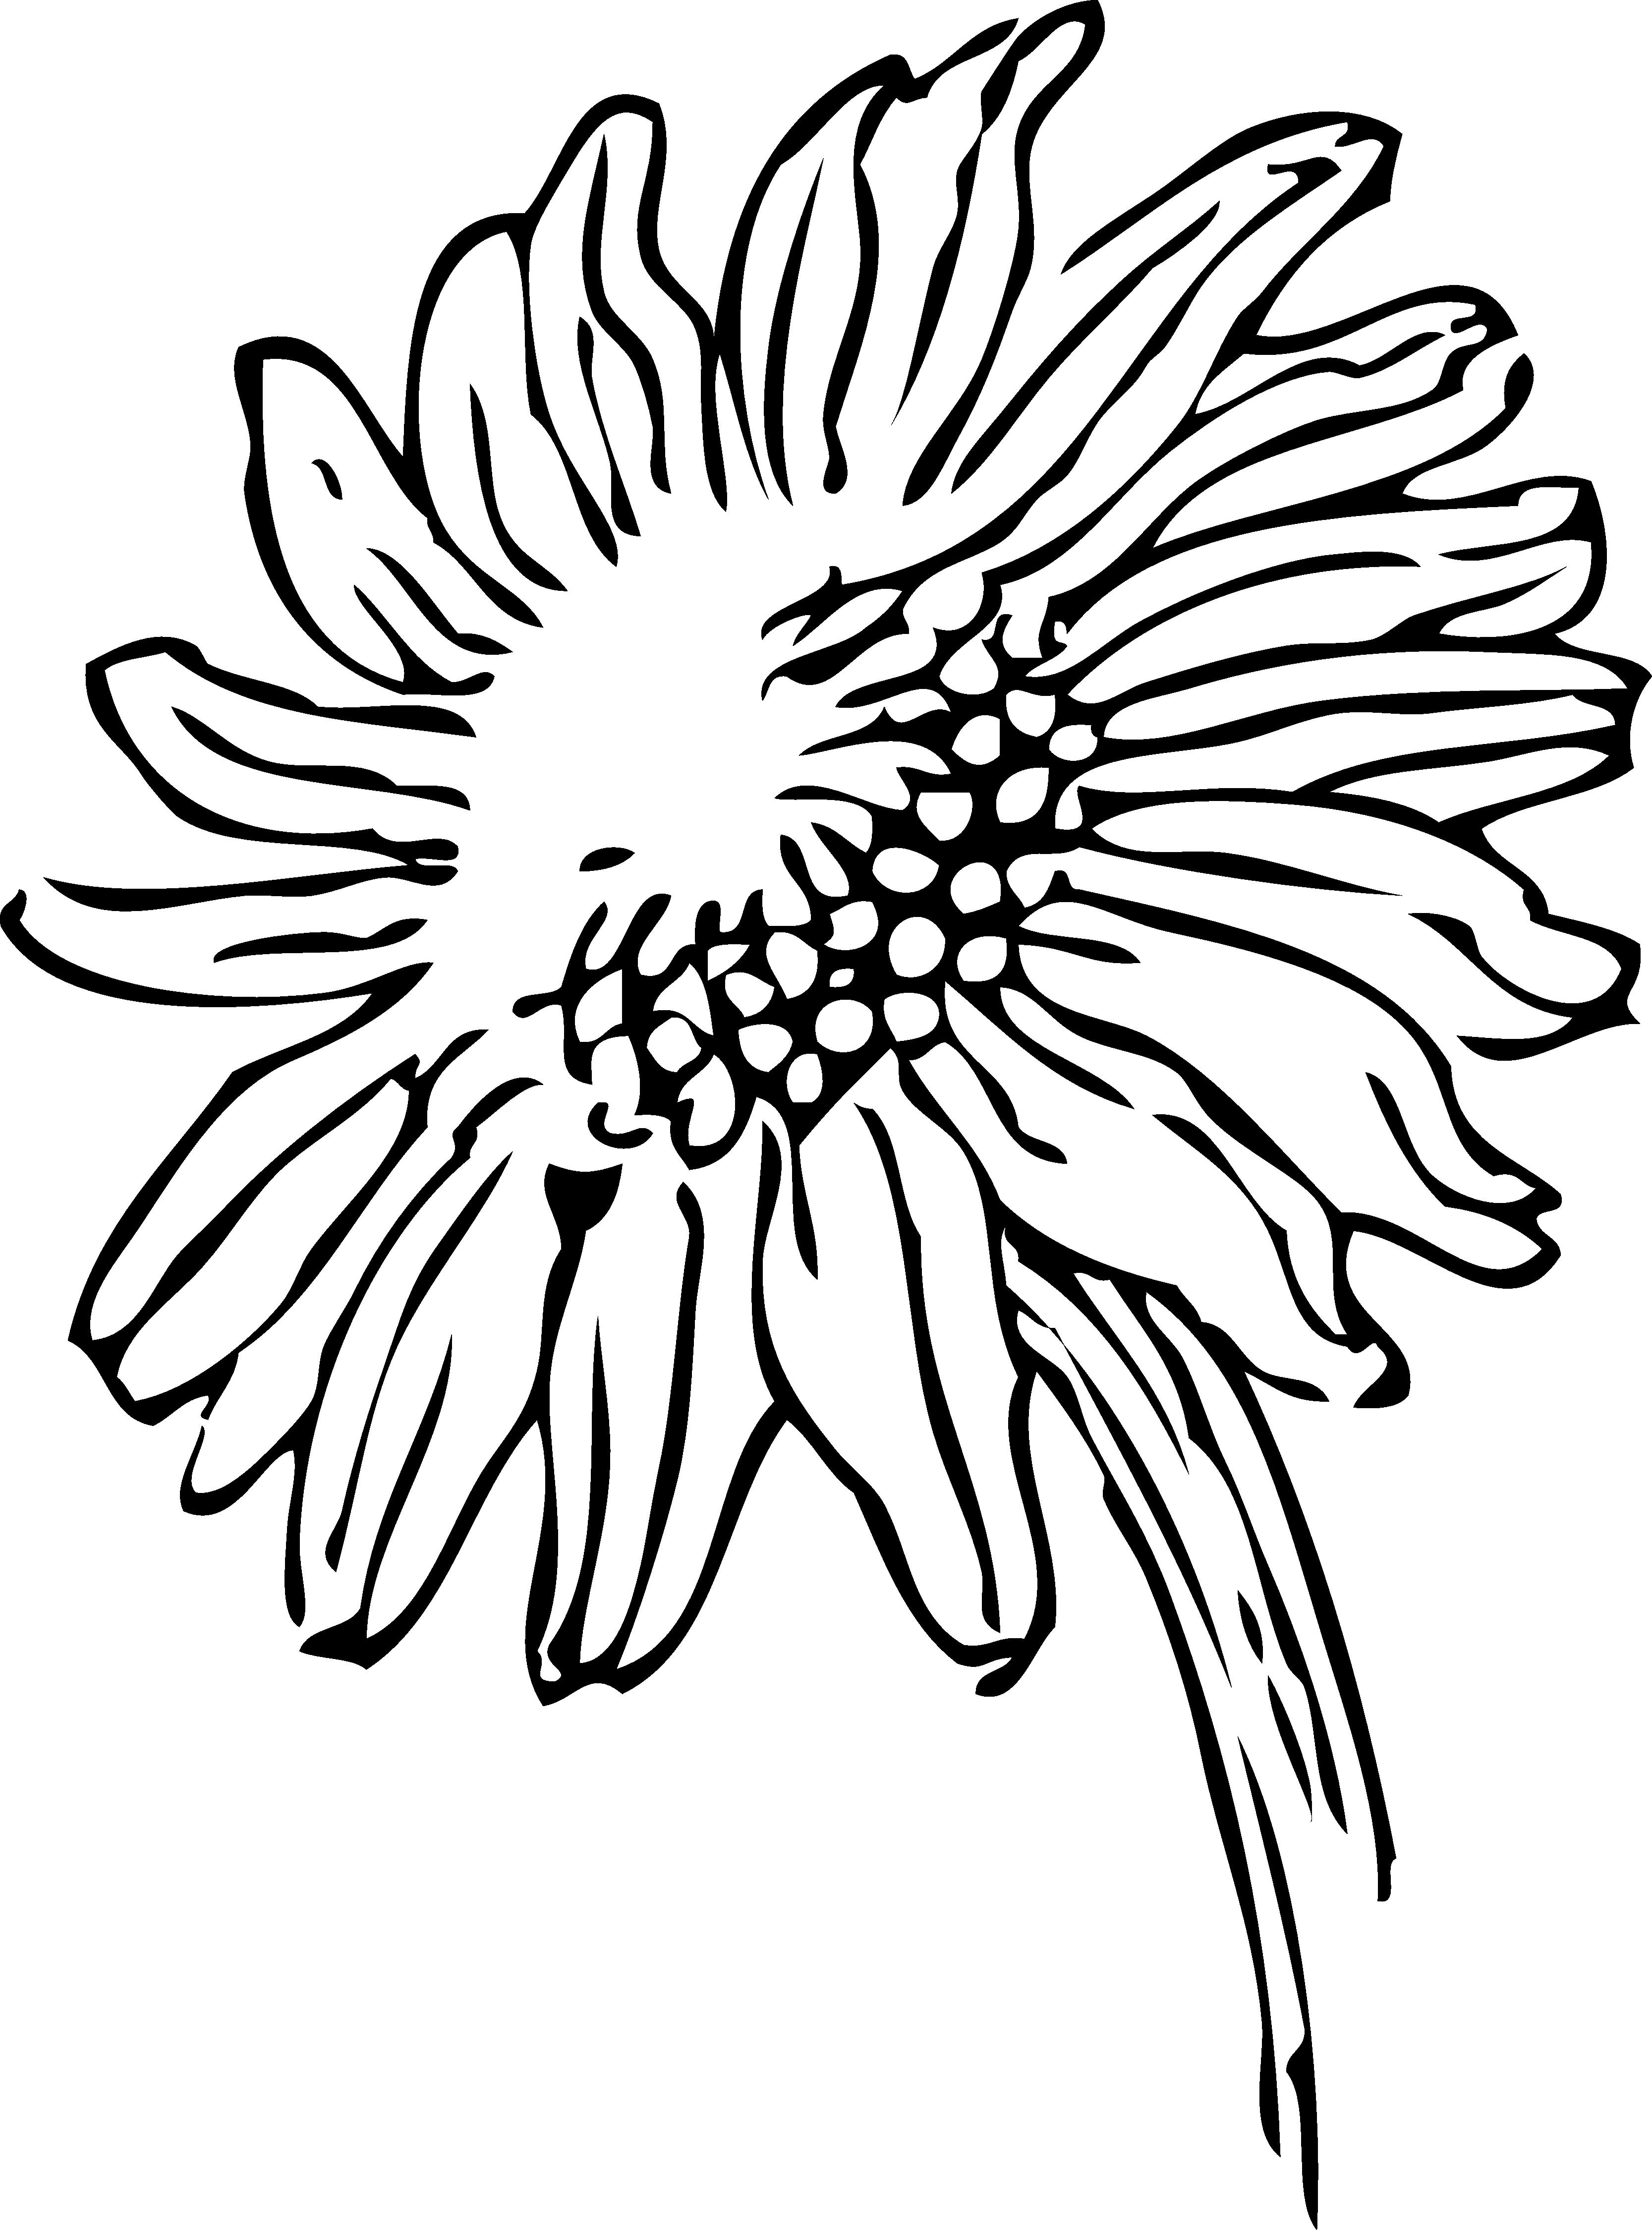 Daisies clipart flowerblack. White flower free on